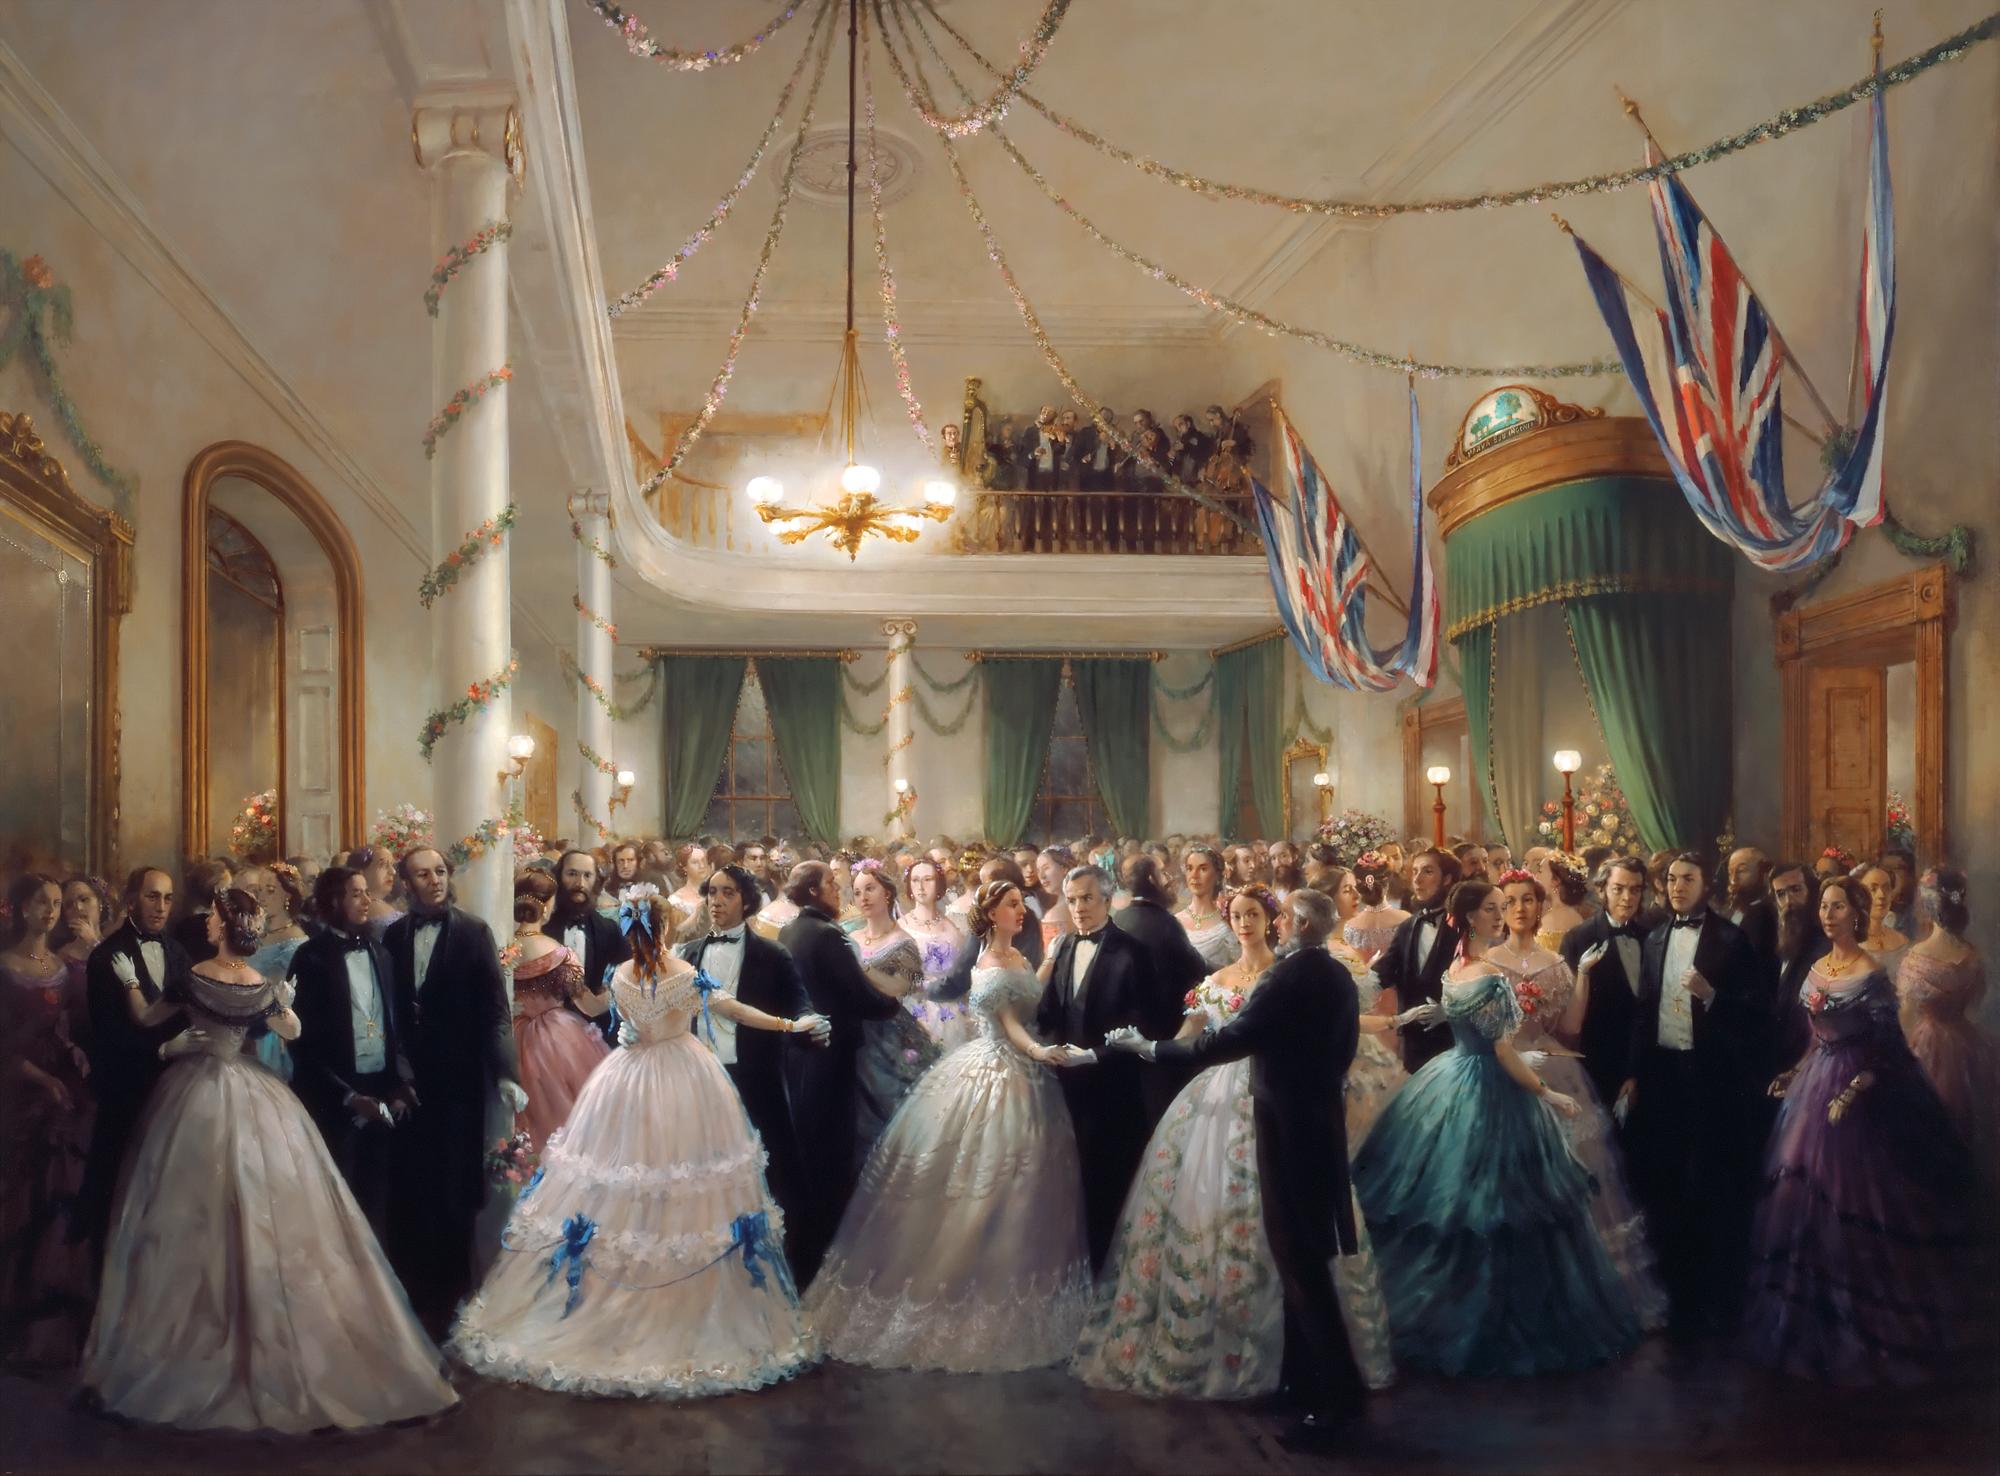 Province House Ball 1864